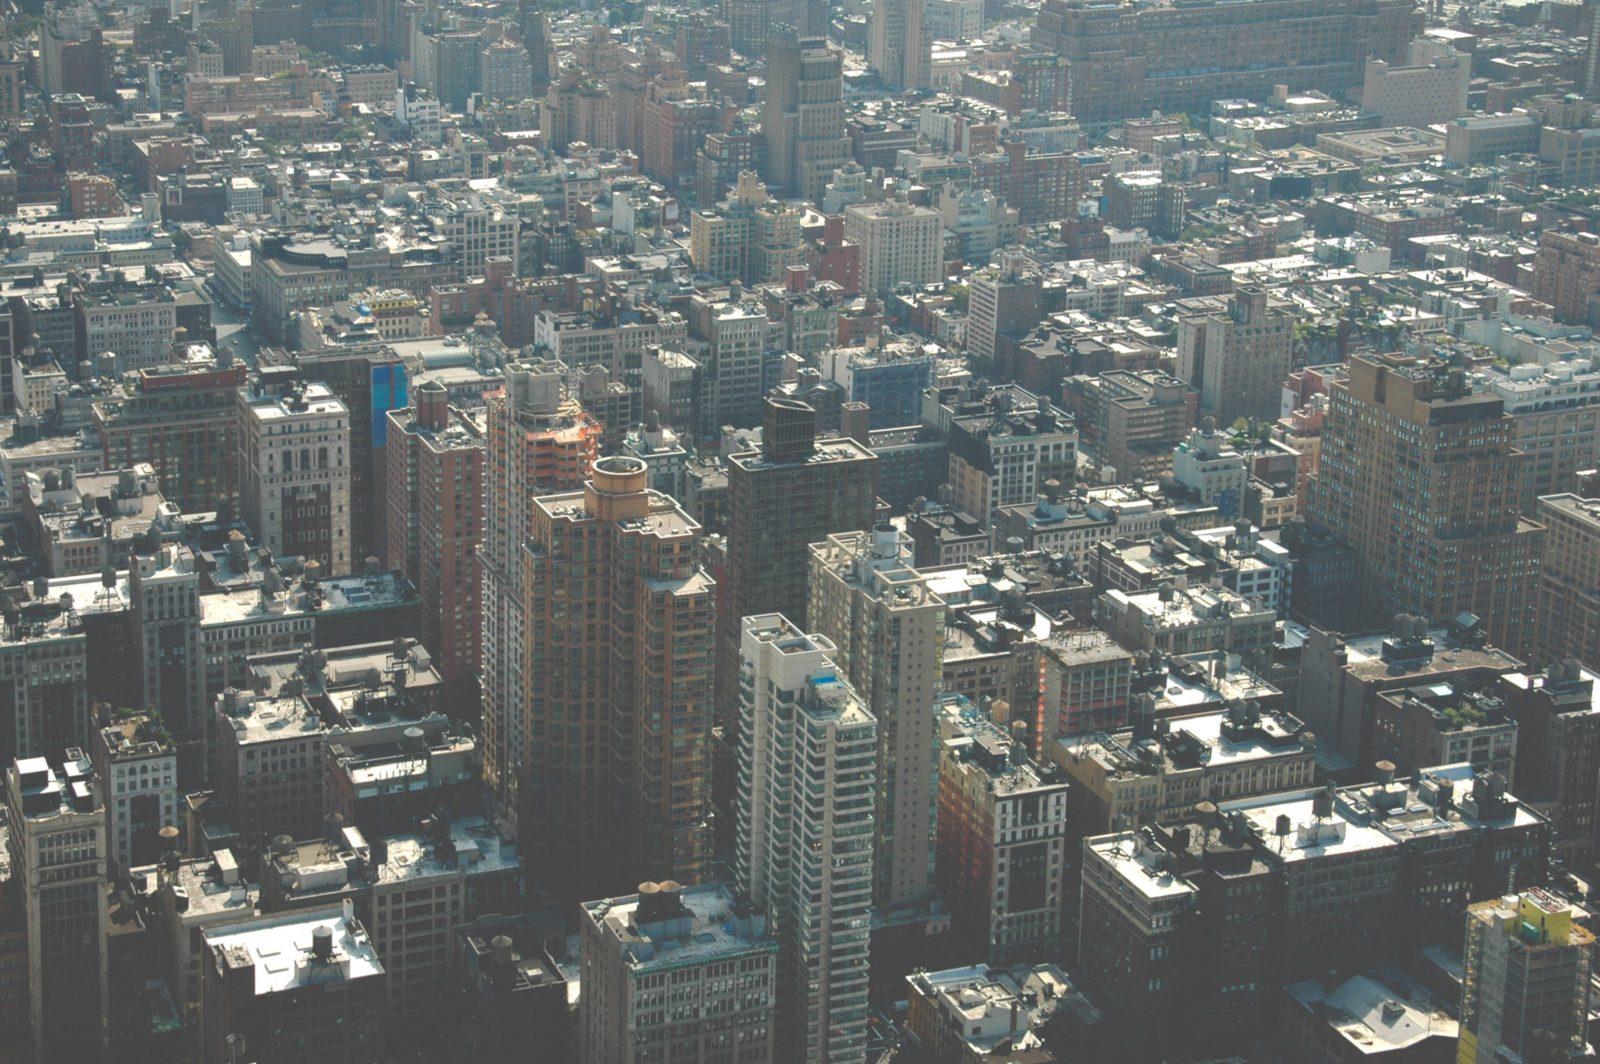 Birds eye view of new York concrete jungle